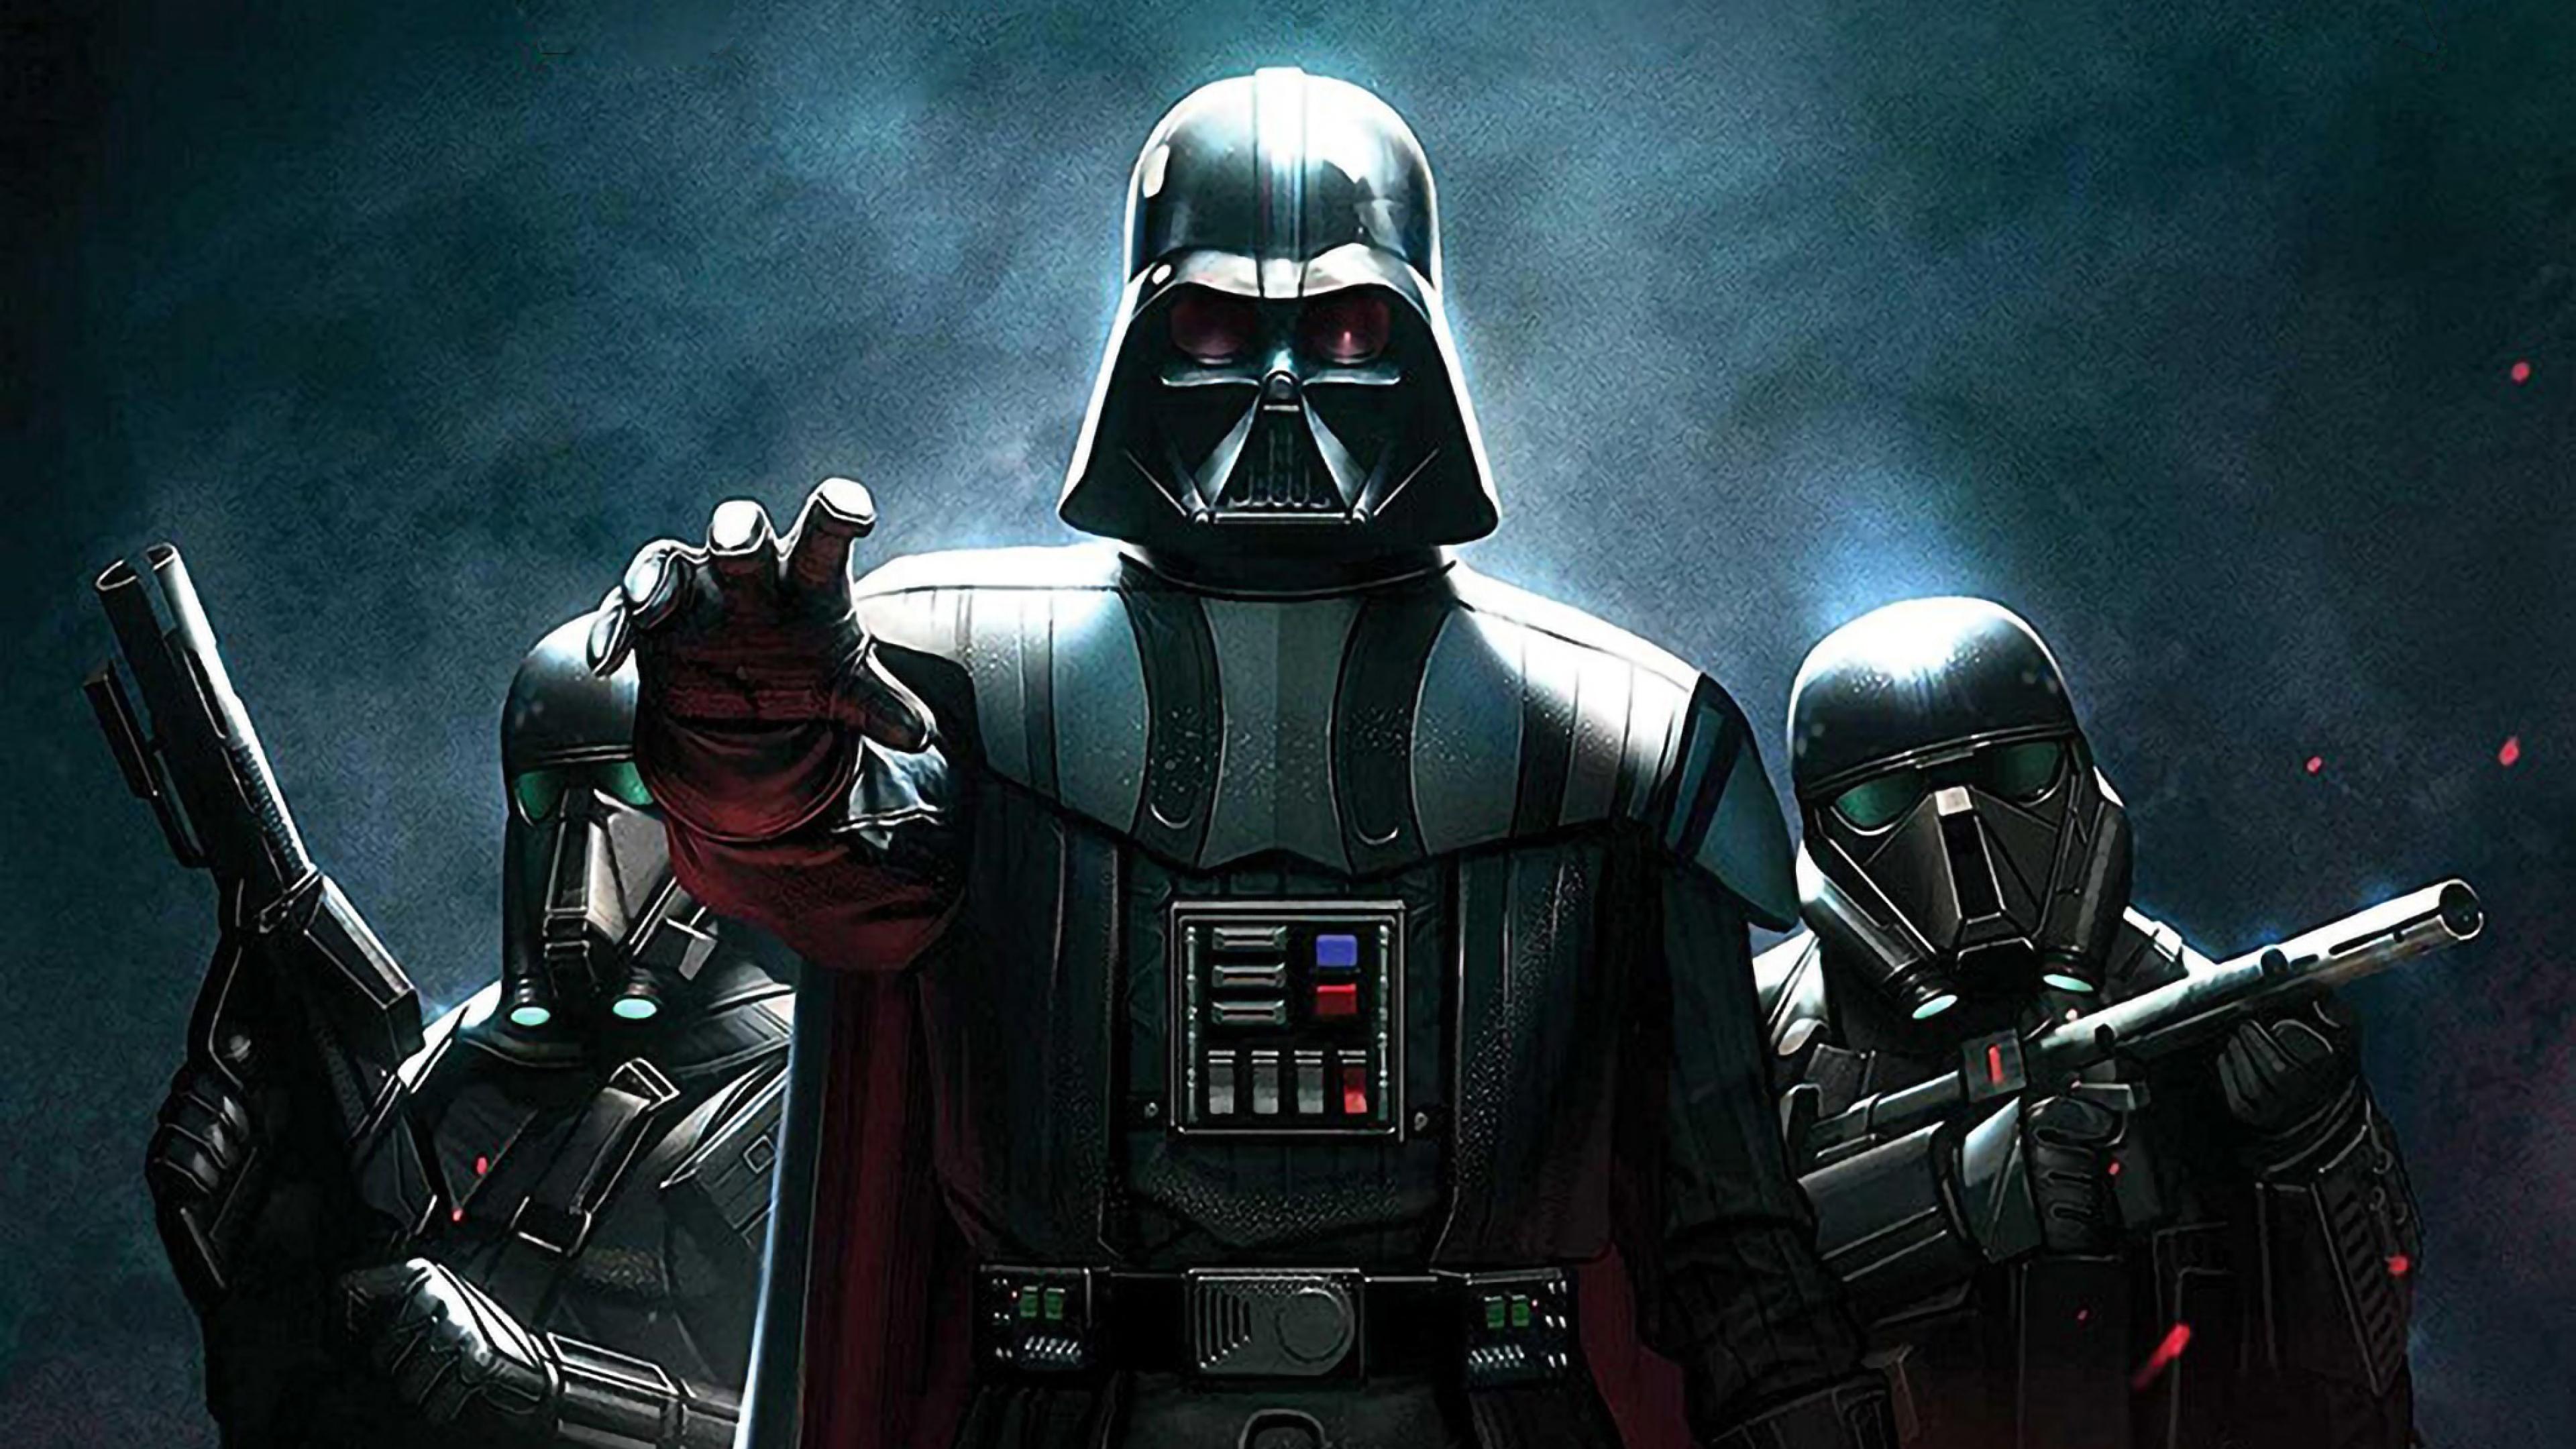 3840x2160 Darth Vedar Star Wars Art 4k Wallpaper Hd Superheroes 4k Wallpapers Images Photos And Background